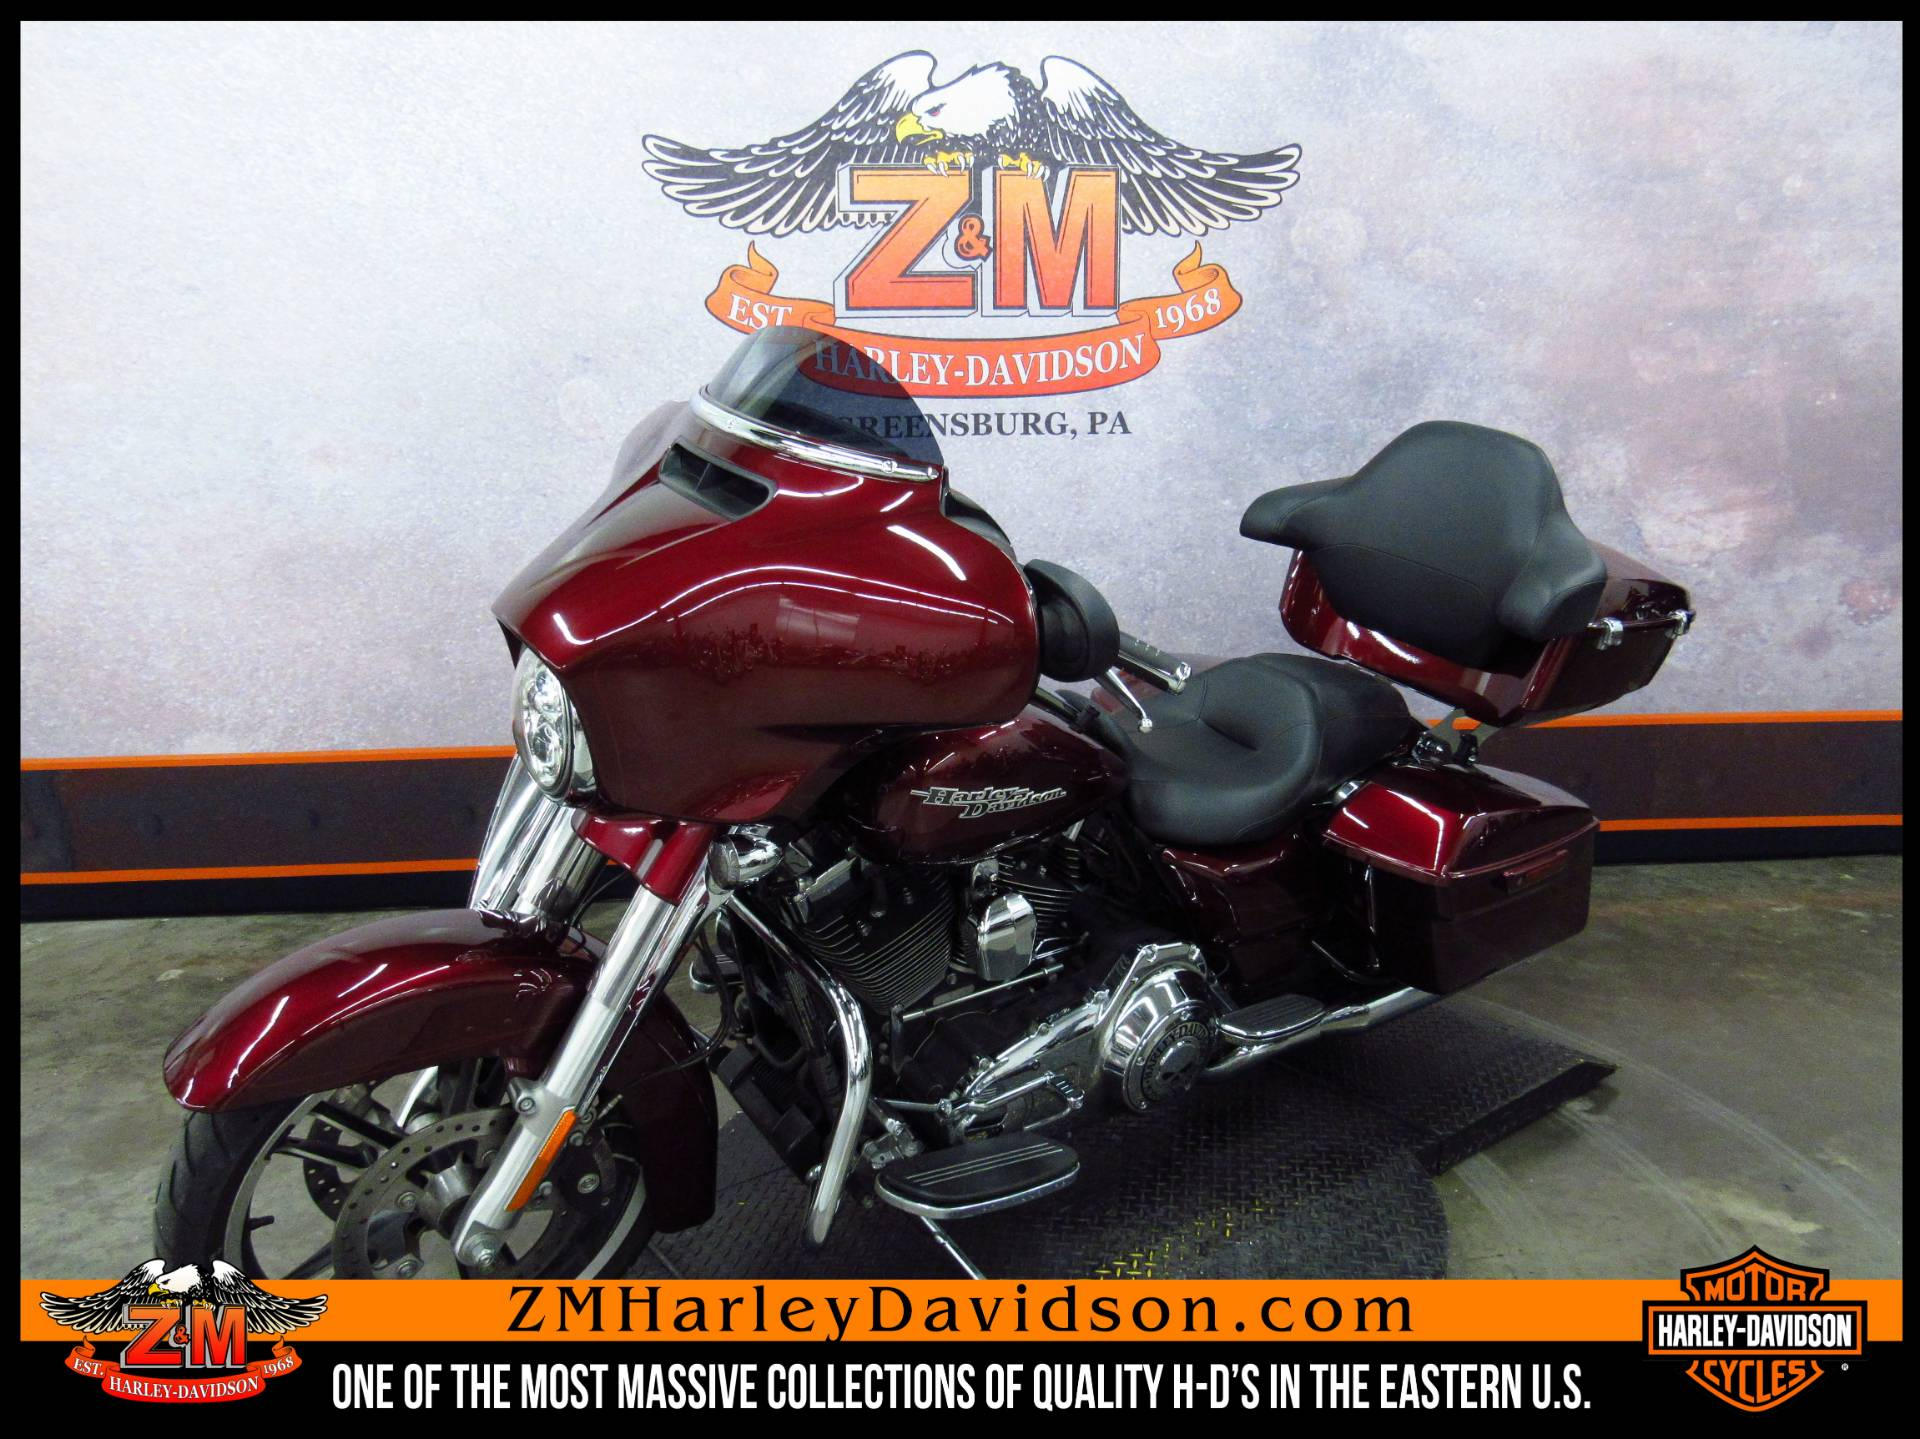 2014 Harley-Davidson Street Glide Special 5